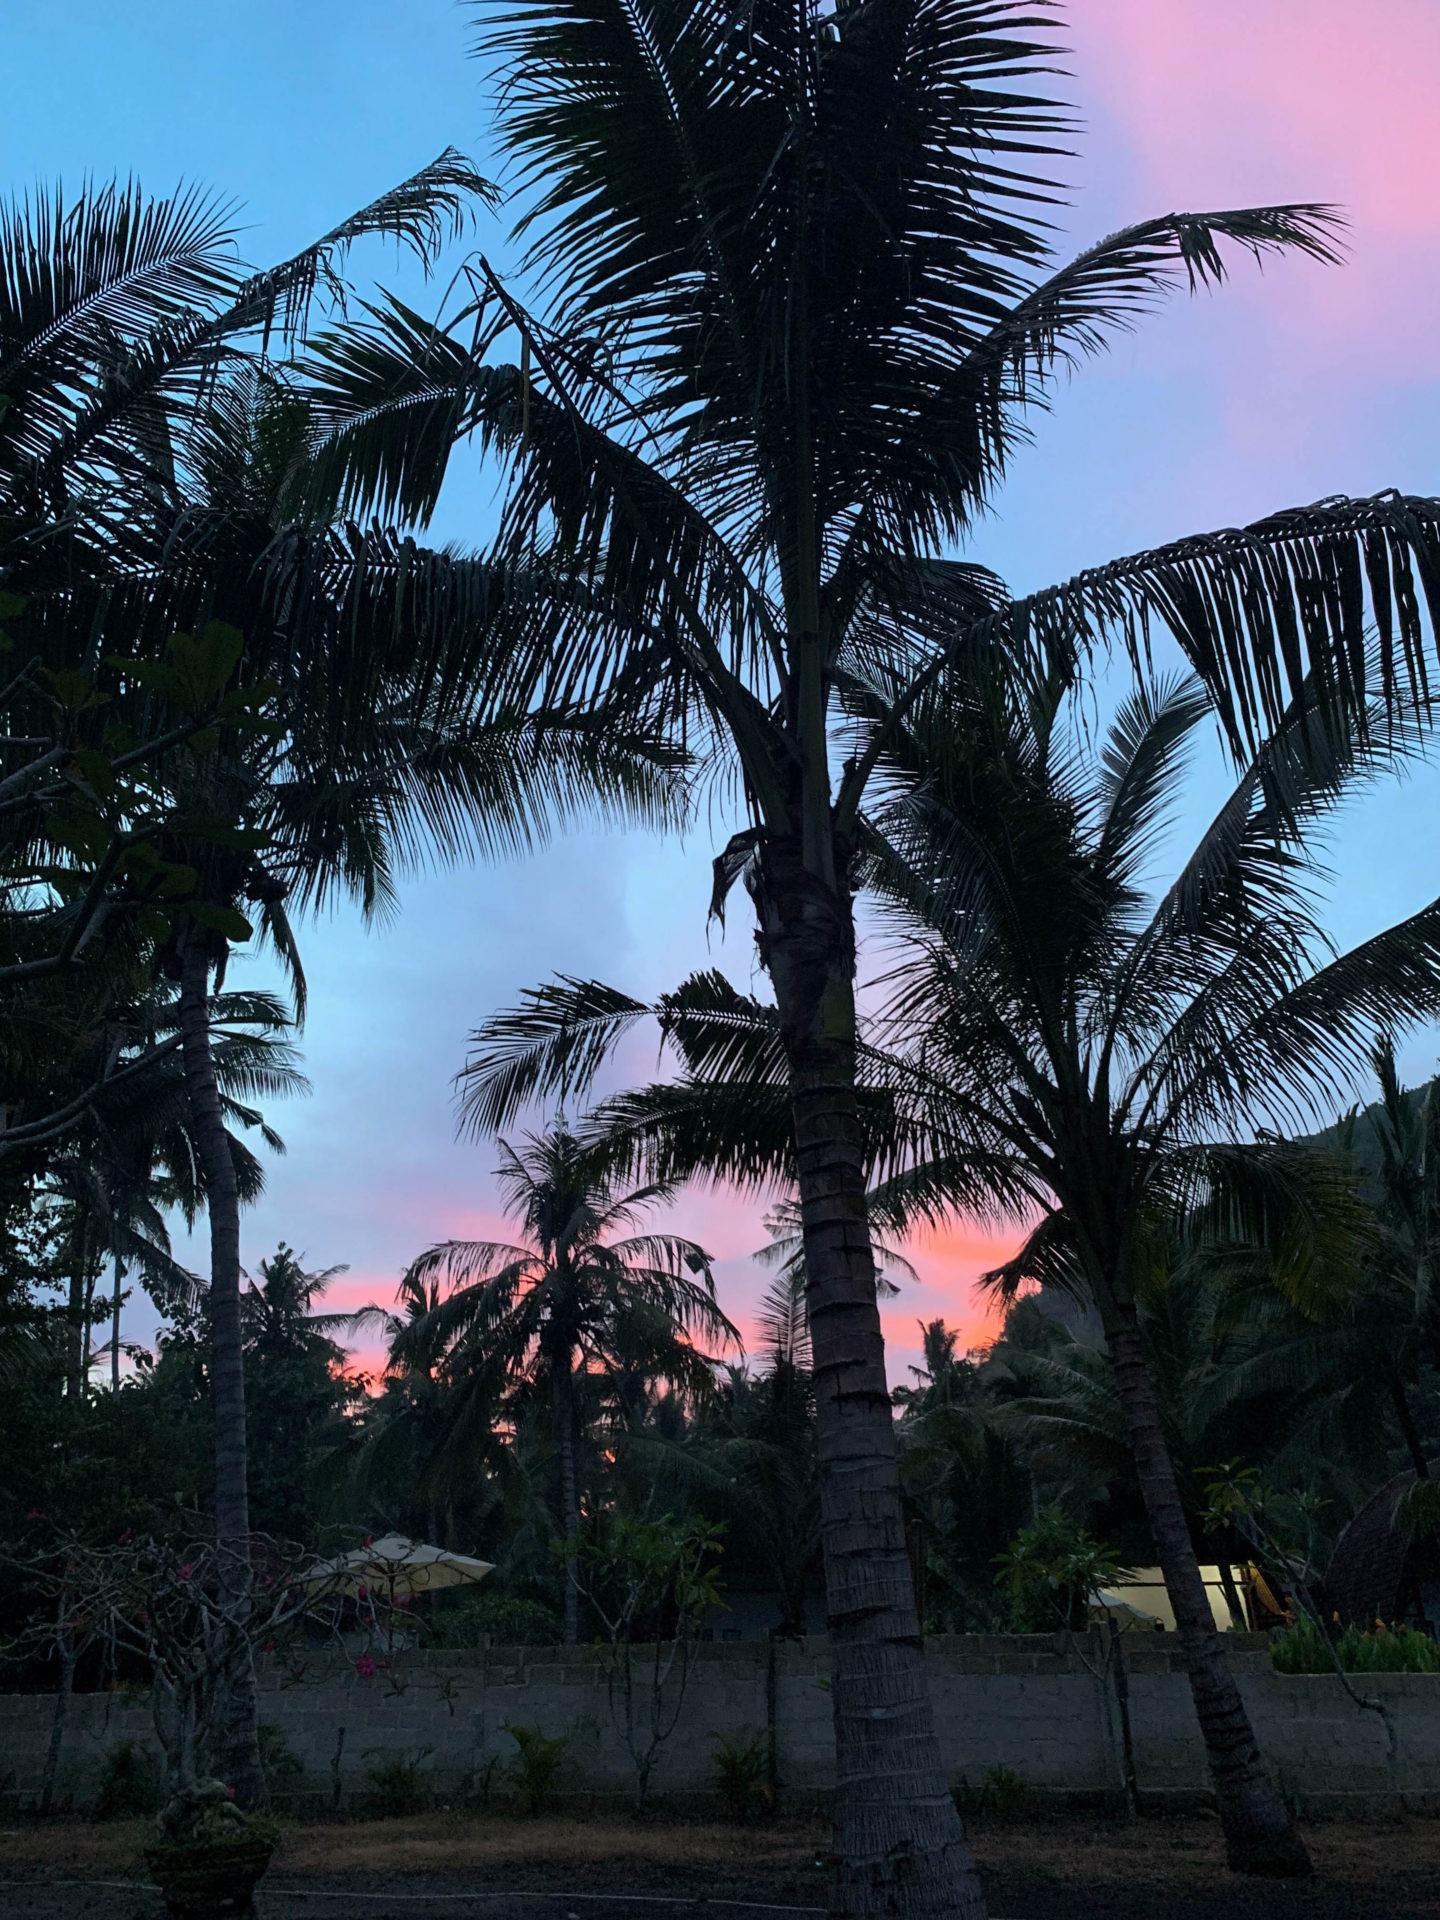 vychod slunce sunrise bali nusa penida trip travelling brunettie island palmtrees